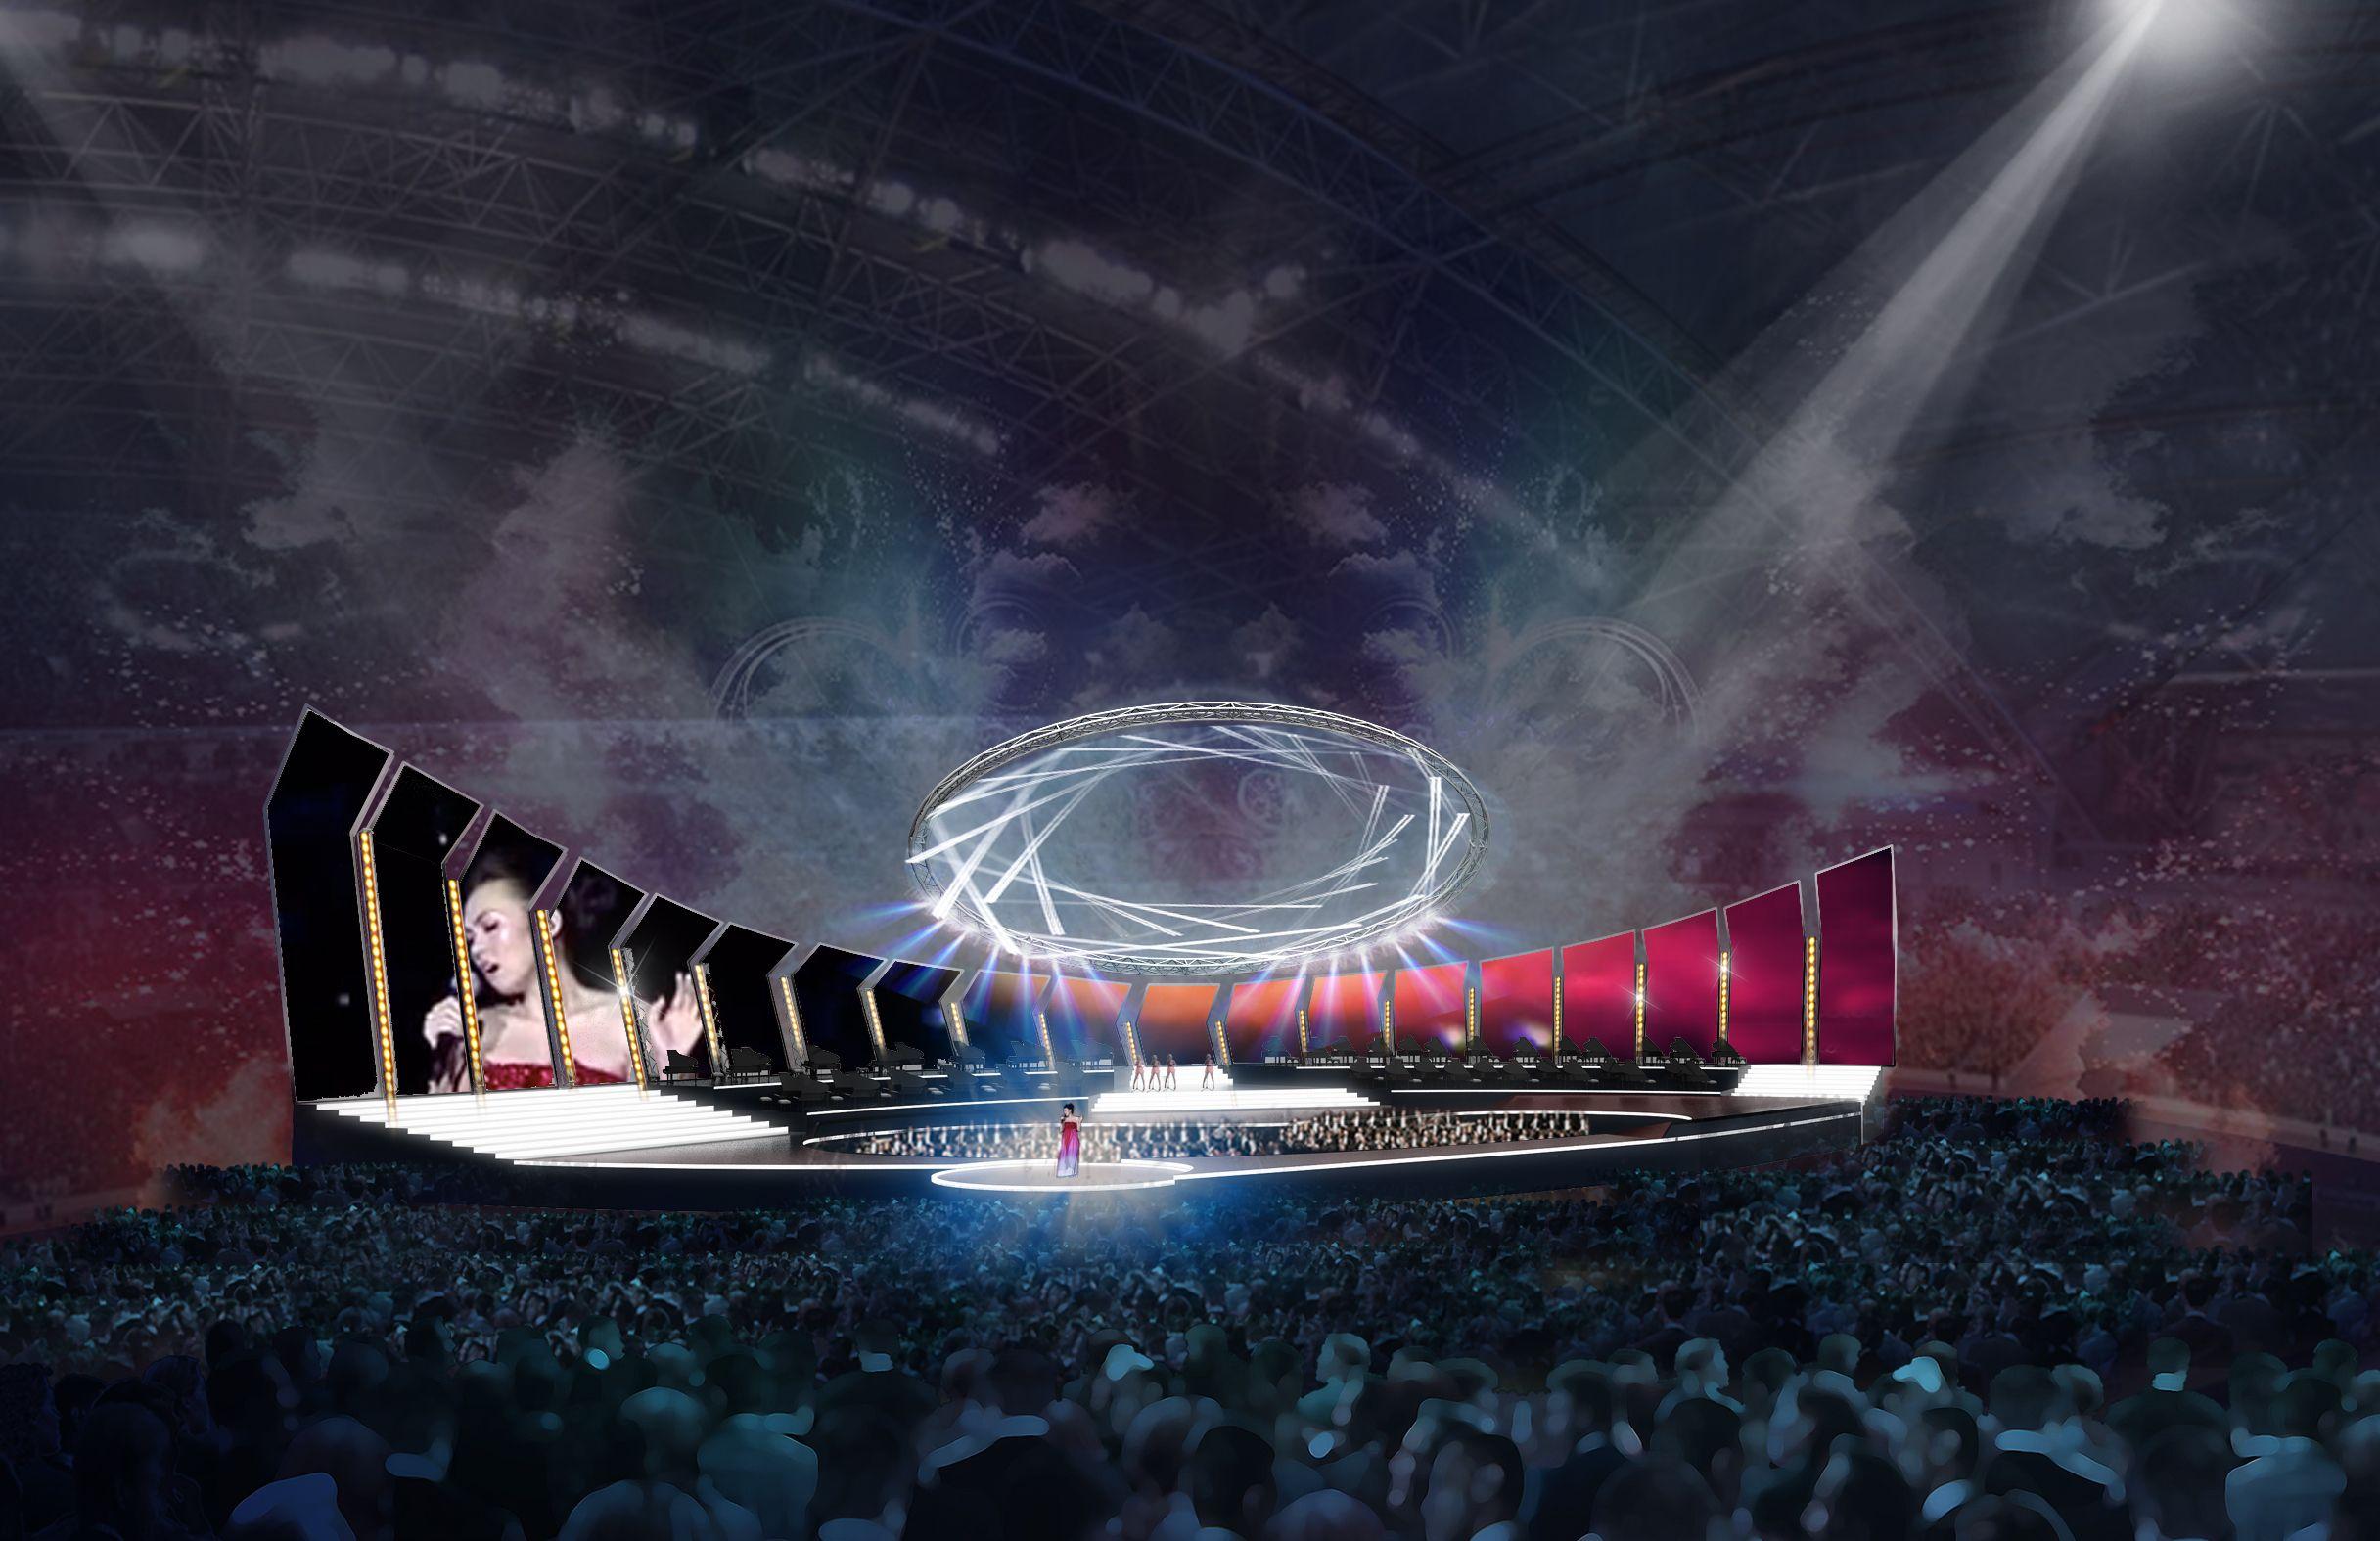 Concept For Stadium Concert Stage Design By Patrick Larsen